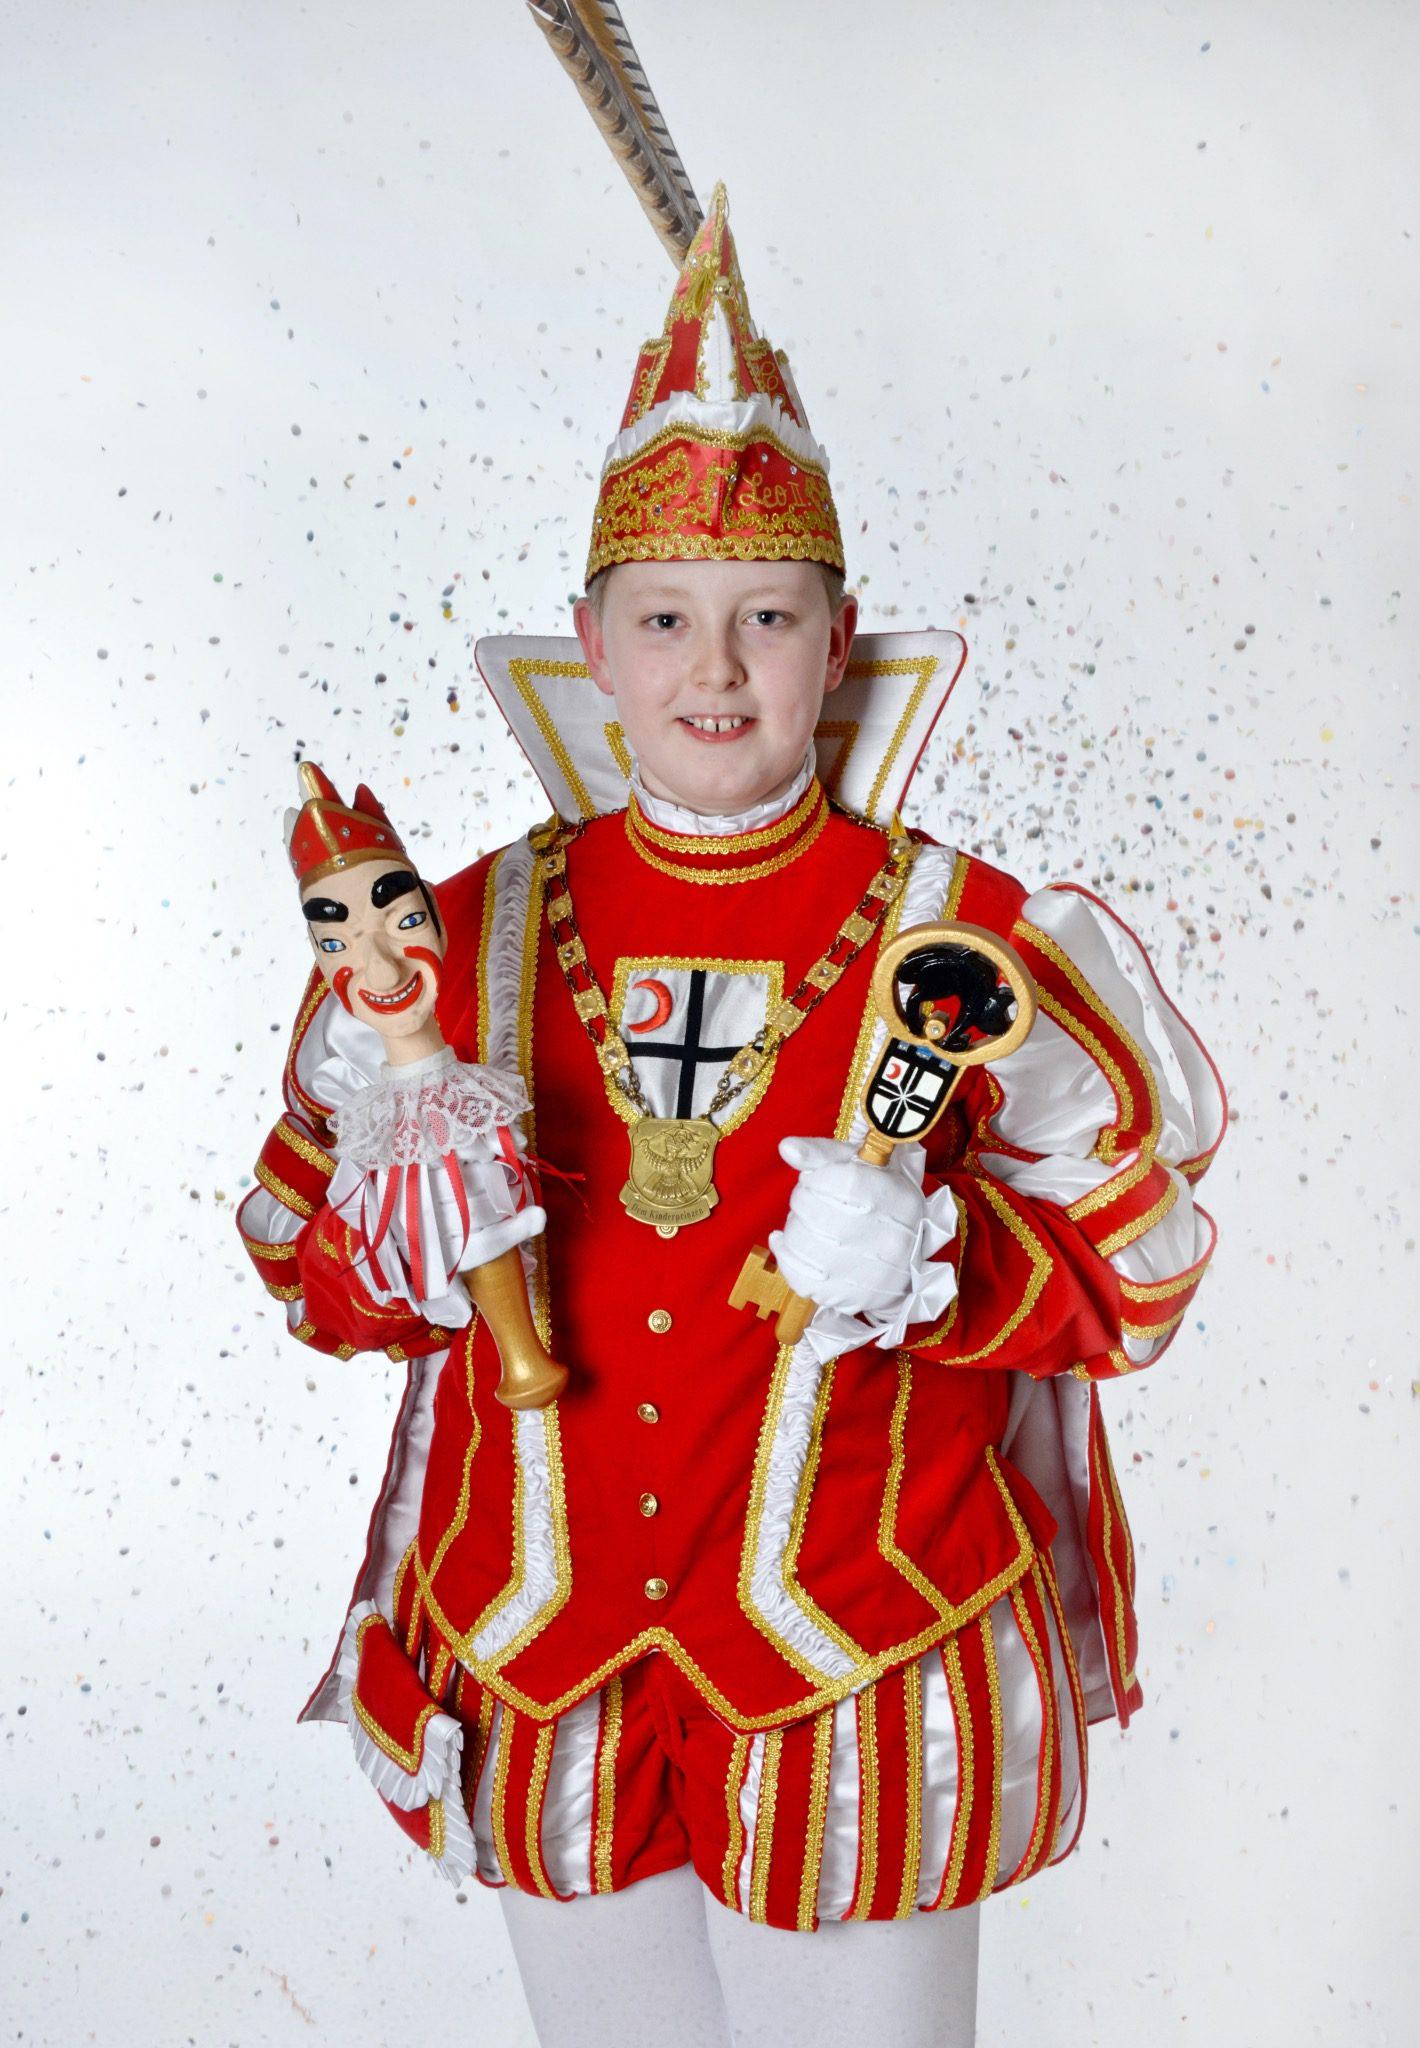 Leo II. (Otte) regiert den närrischen Nachwuchs